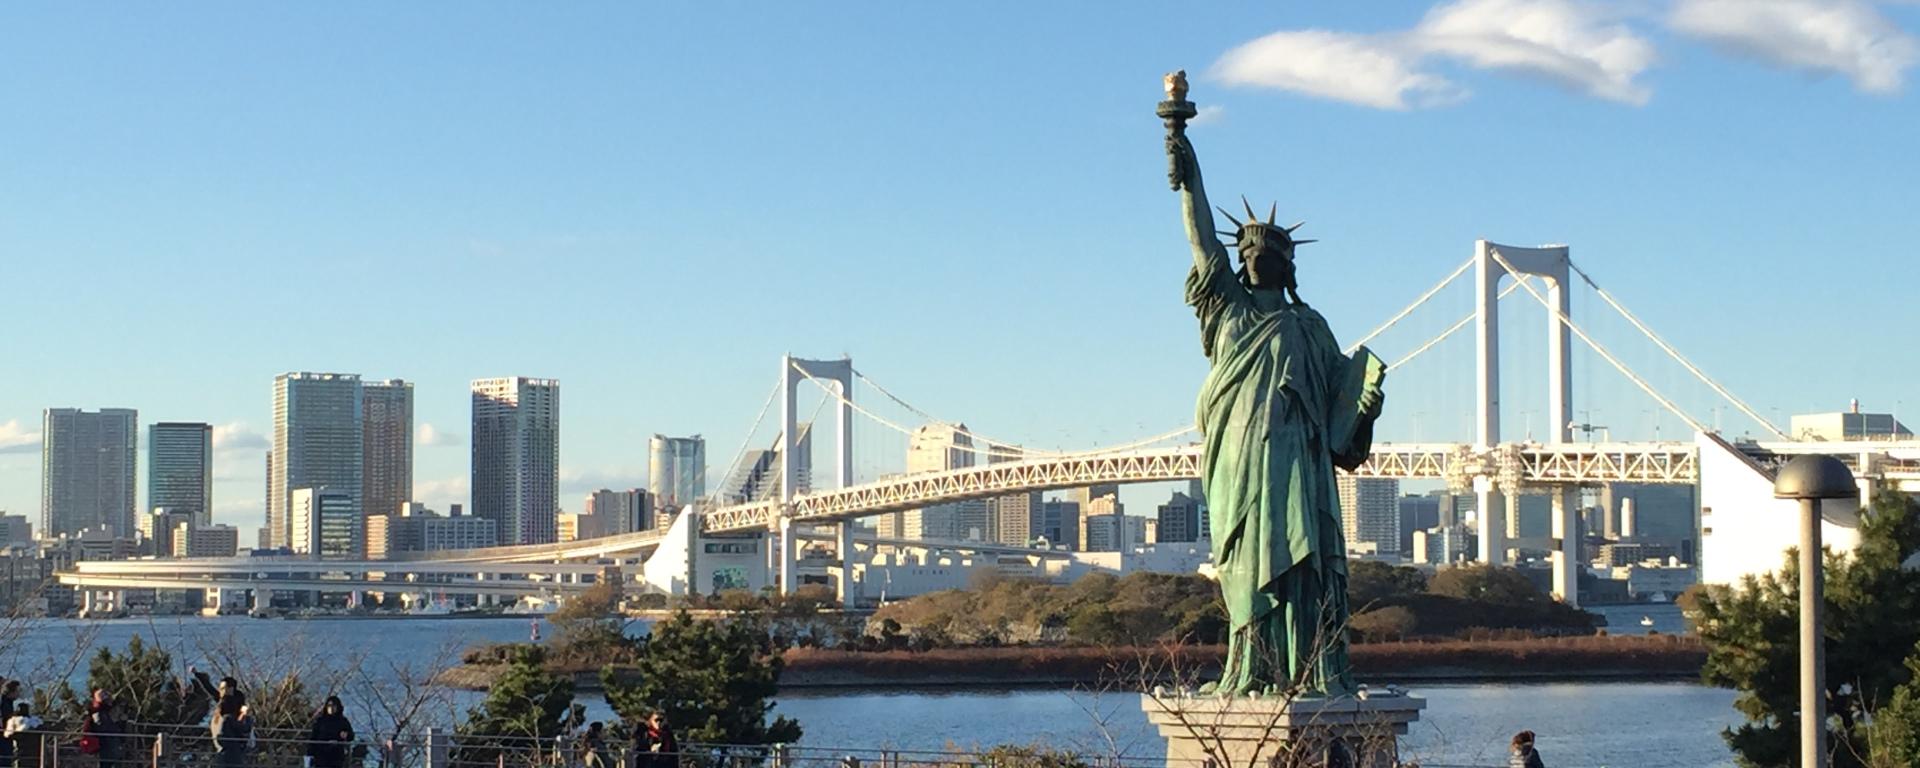 Du lịch Nhật Bản: TOKYO – HAKONE – FUJI – NARITA